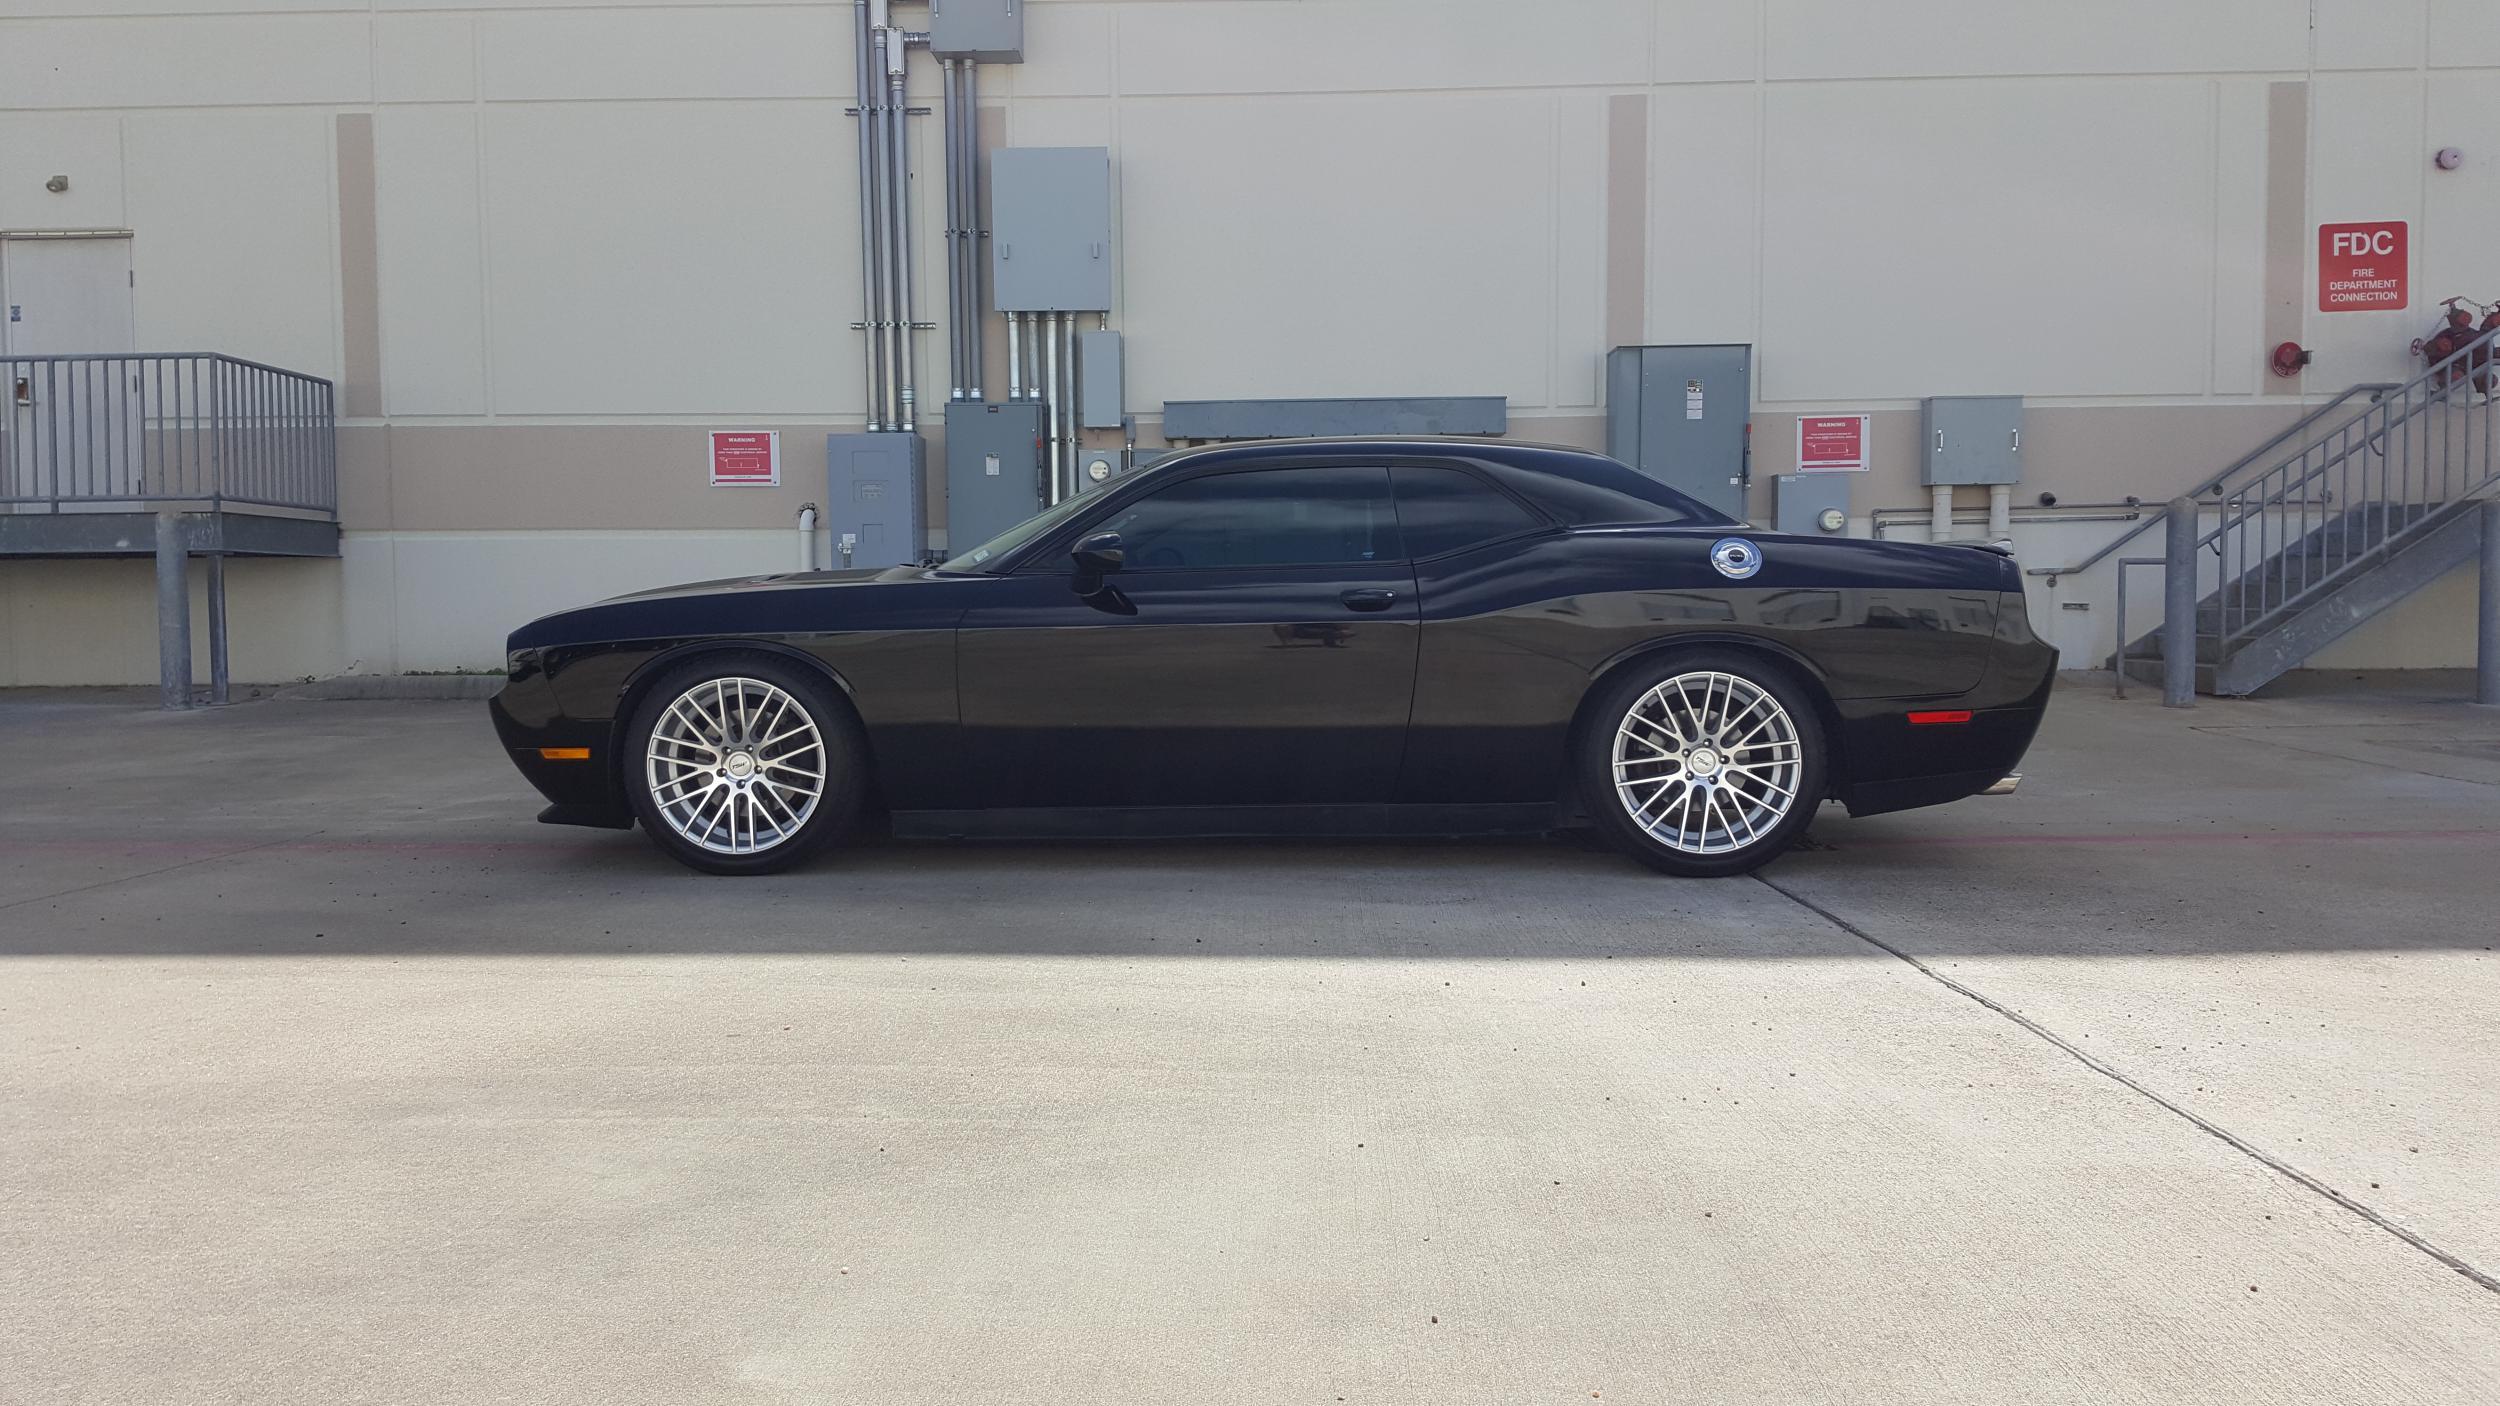 Best Coilovers For Challenger Dodge Challenger Forum